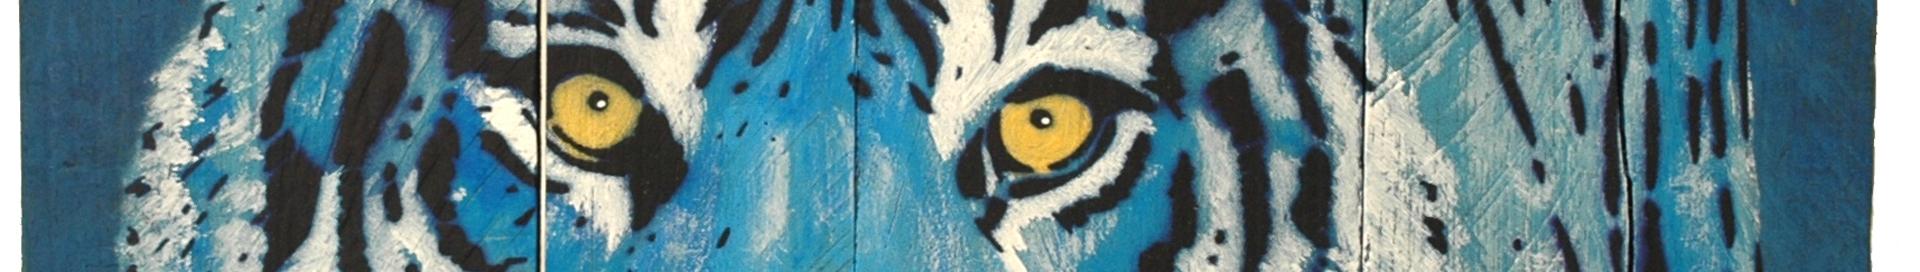 mosko works street artist, MOSKO – Wildlife Street Artist